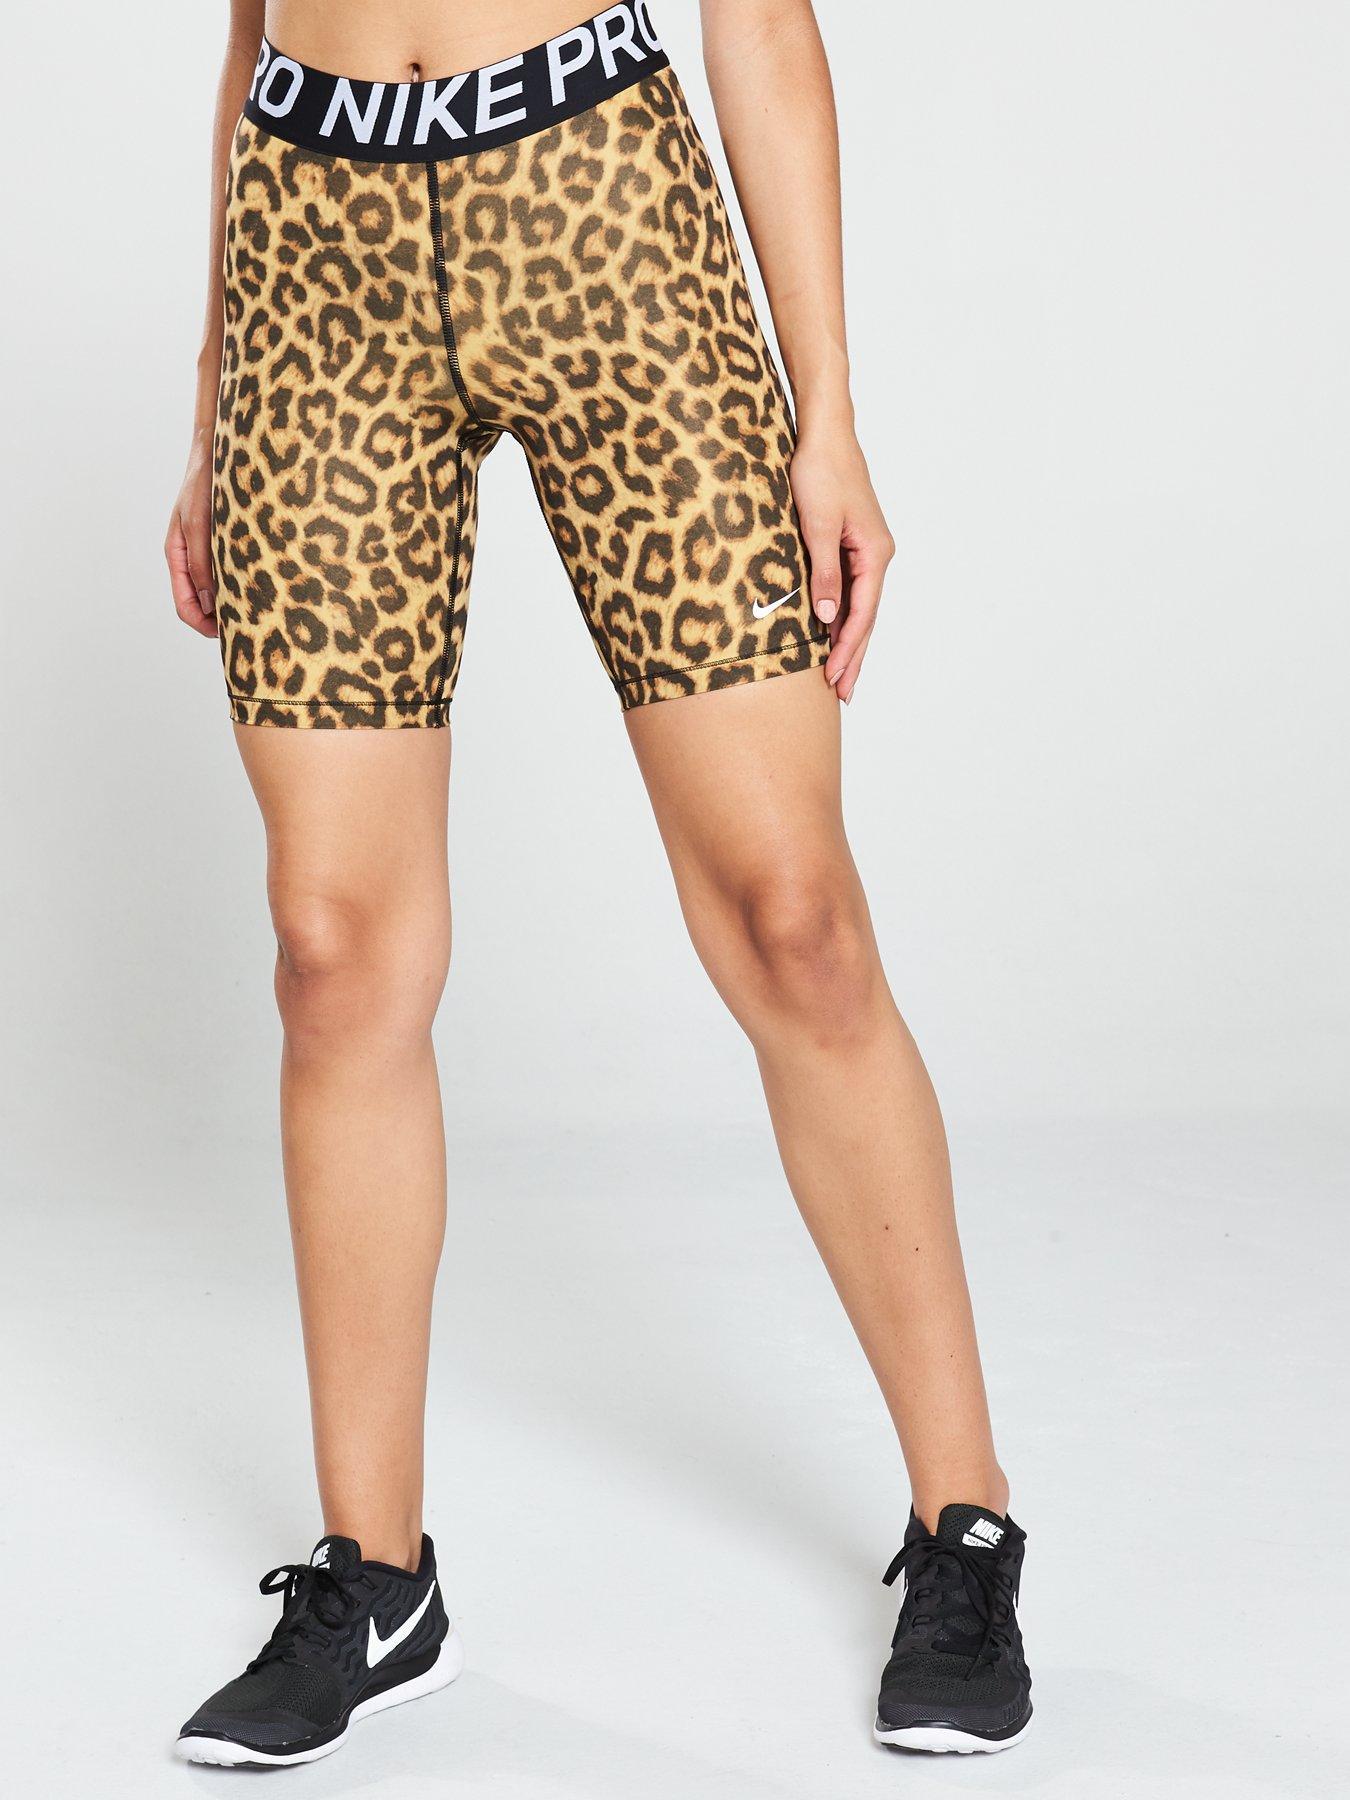 nike leopard print shorts